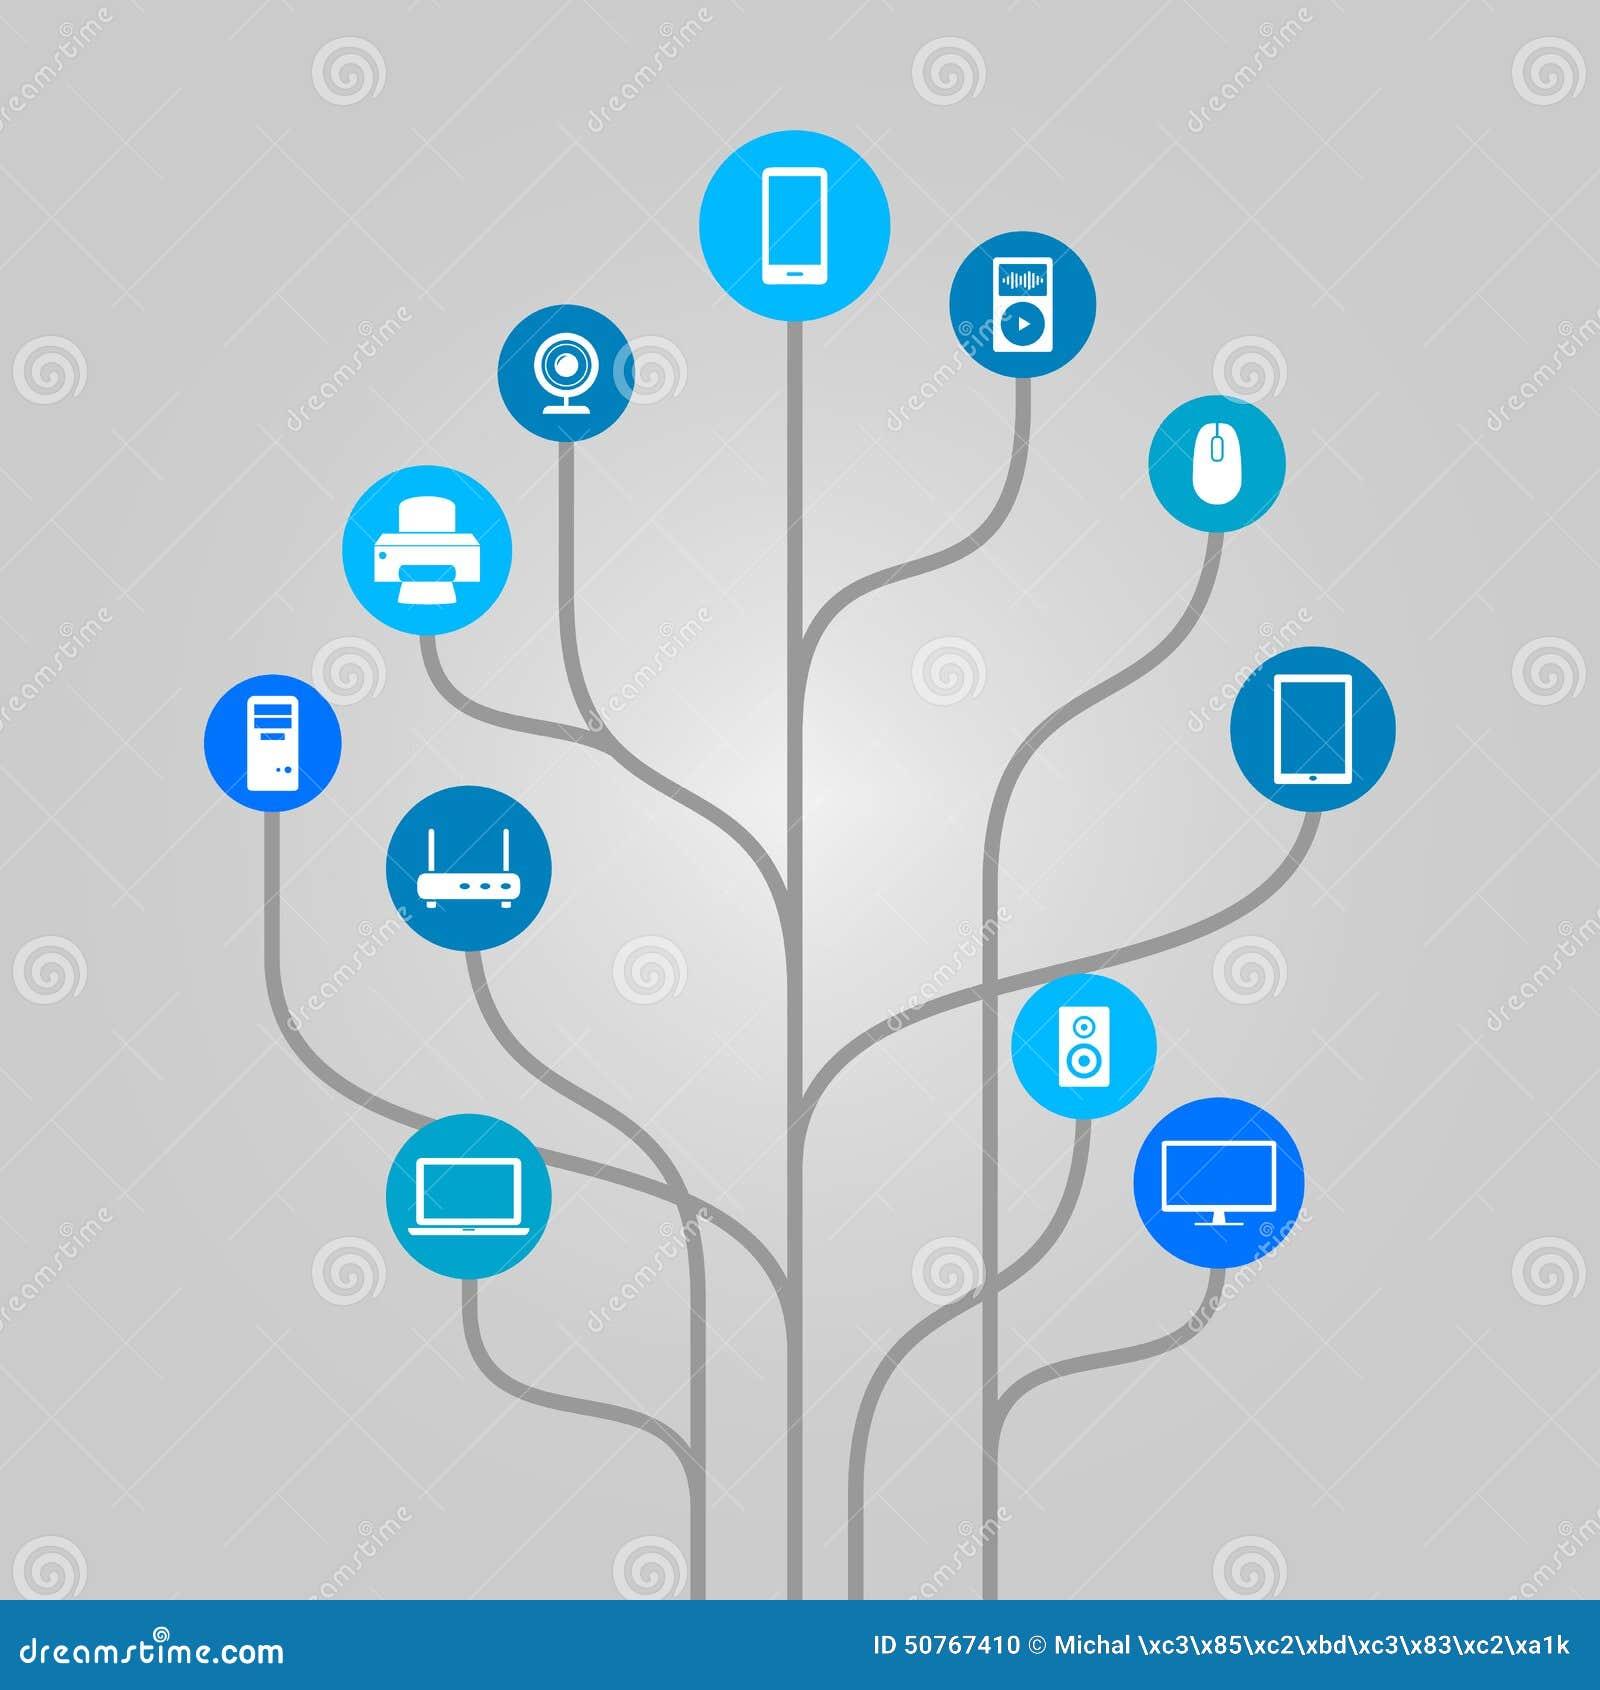 Abstract Icon Tree Illustration - Computer Hardware